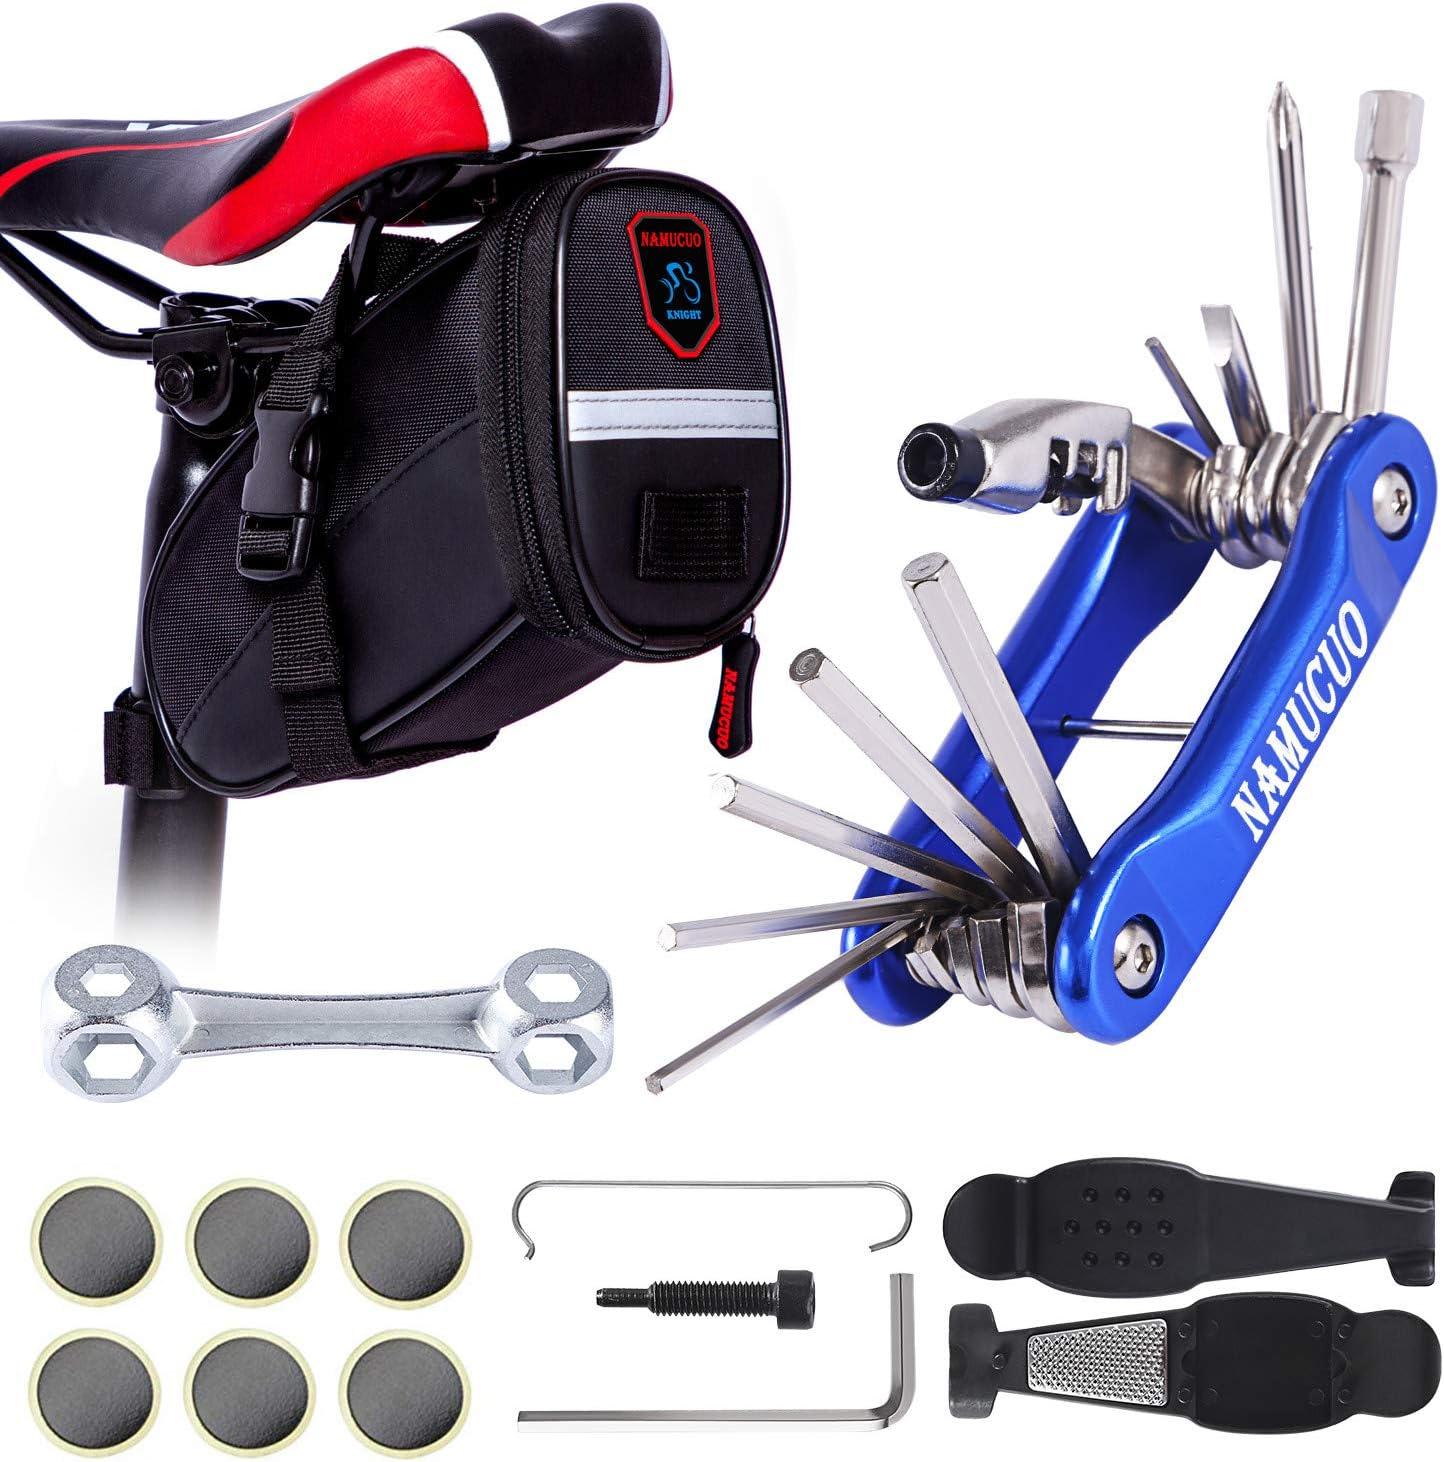 YBEKI Saddle Bag Bike Repair Tool with - Rapid rise San Diego Mall Set Kits B Bicycle